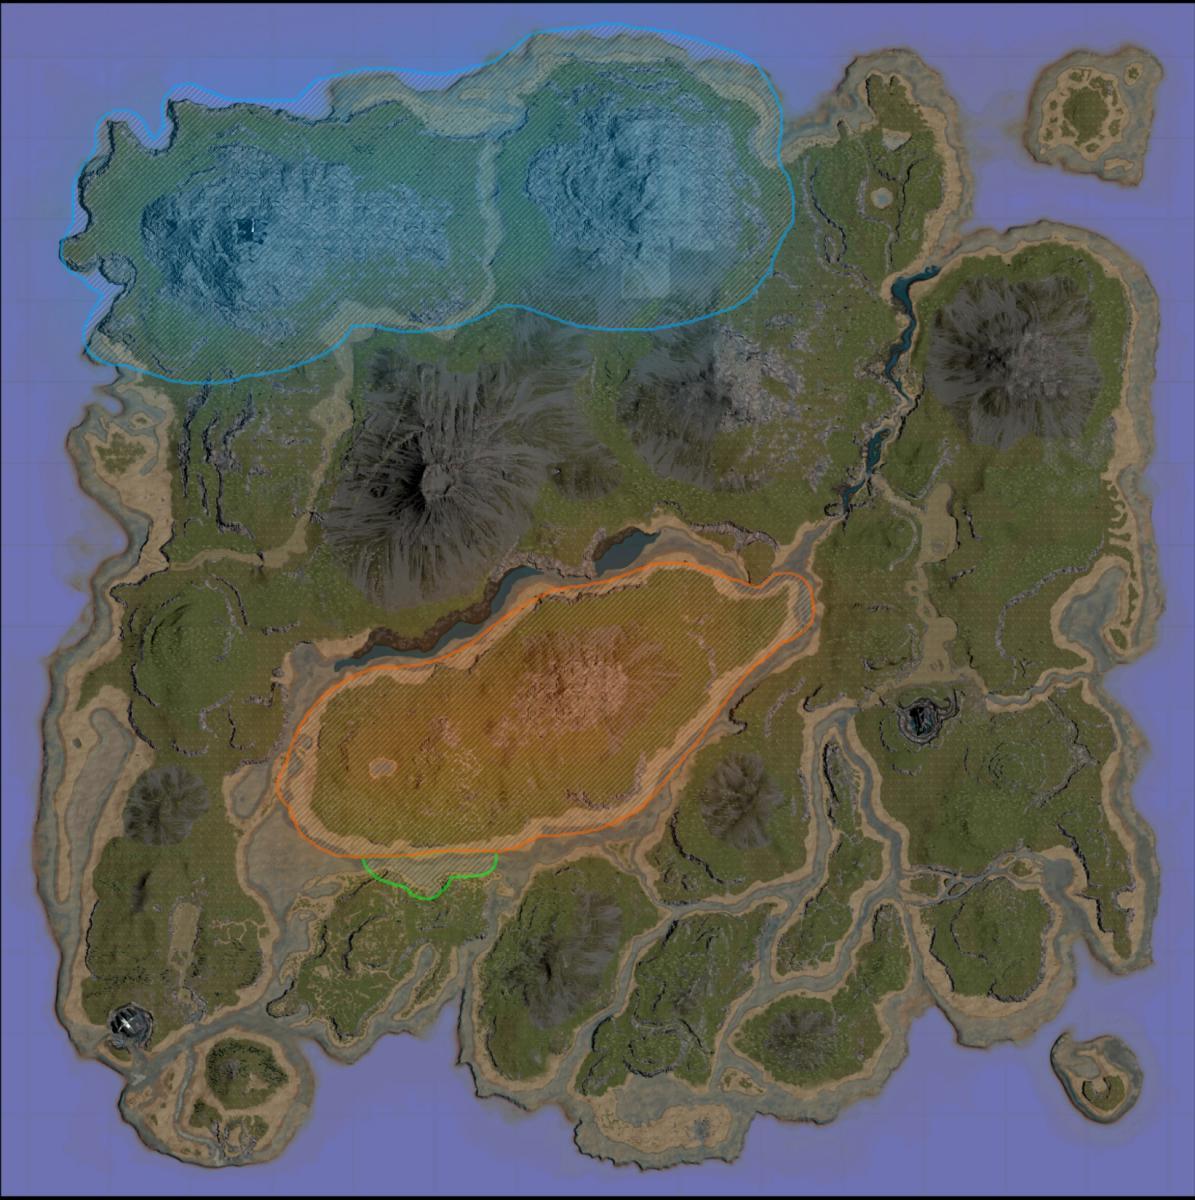 Map Biome Changes Large 573226dc73cea 7d85d9d02d8f501a9e3931c34eedfcb5f89592a0c6092bd0fepimgpsh Fullsize Distr Jpg